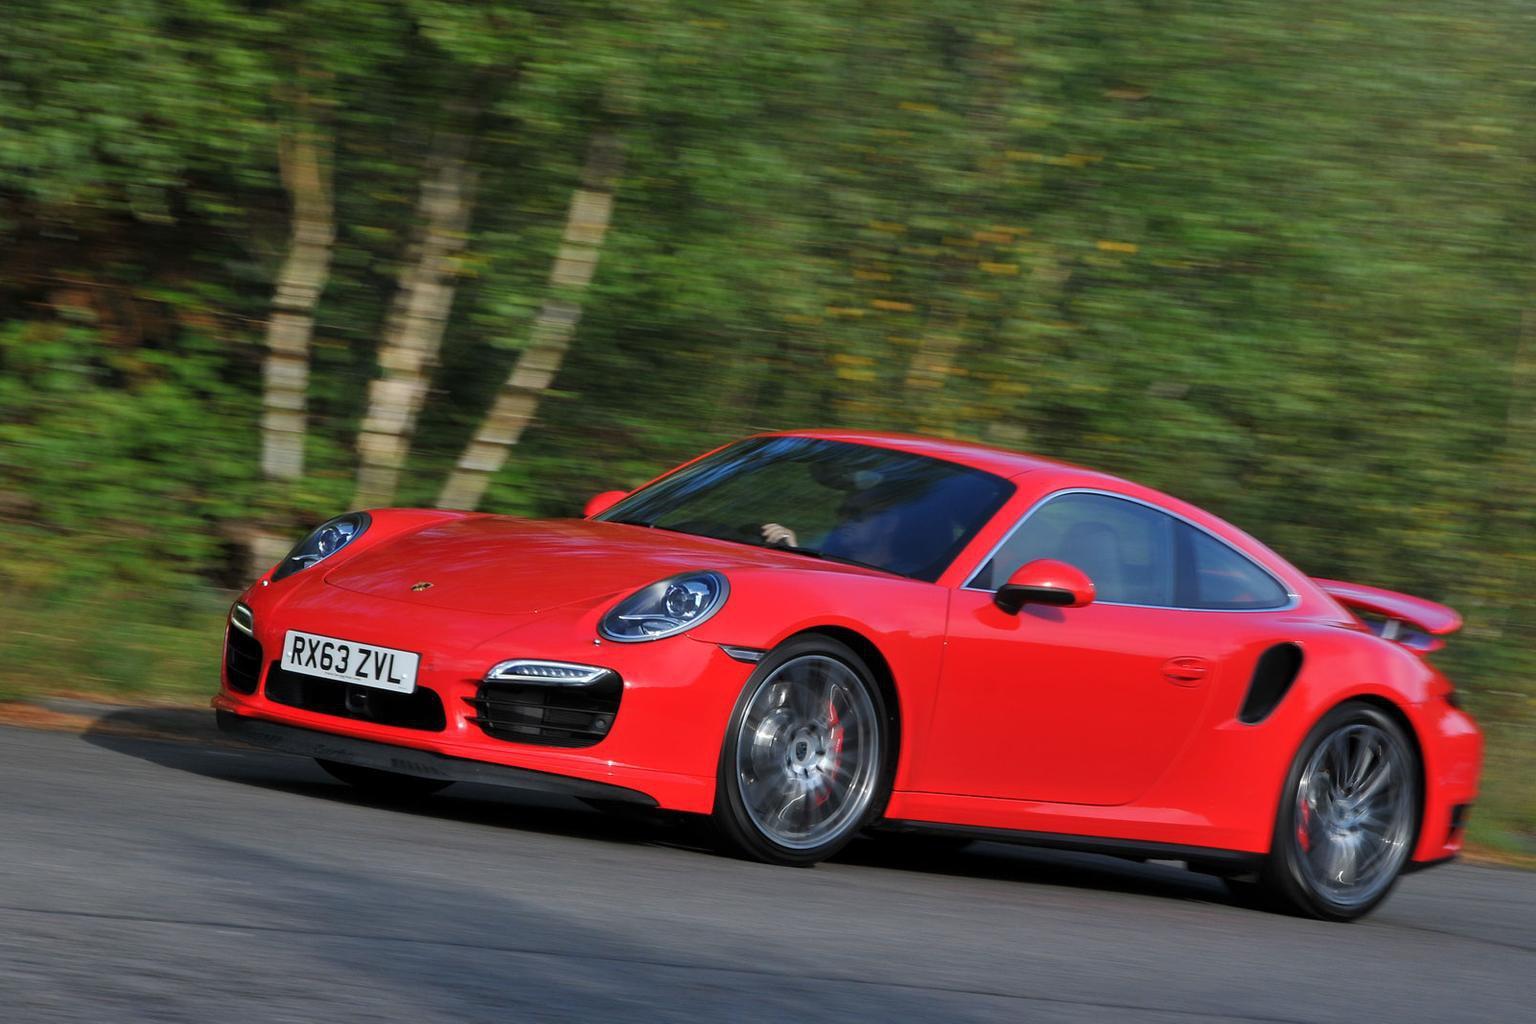 2013 Porsche 911 Turbo review